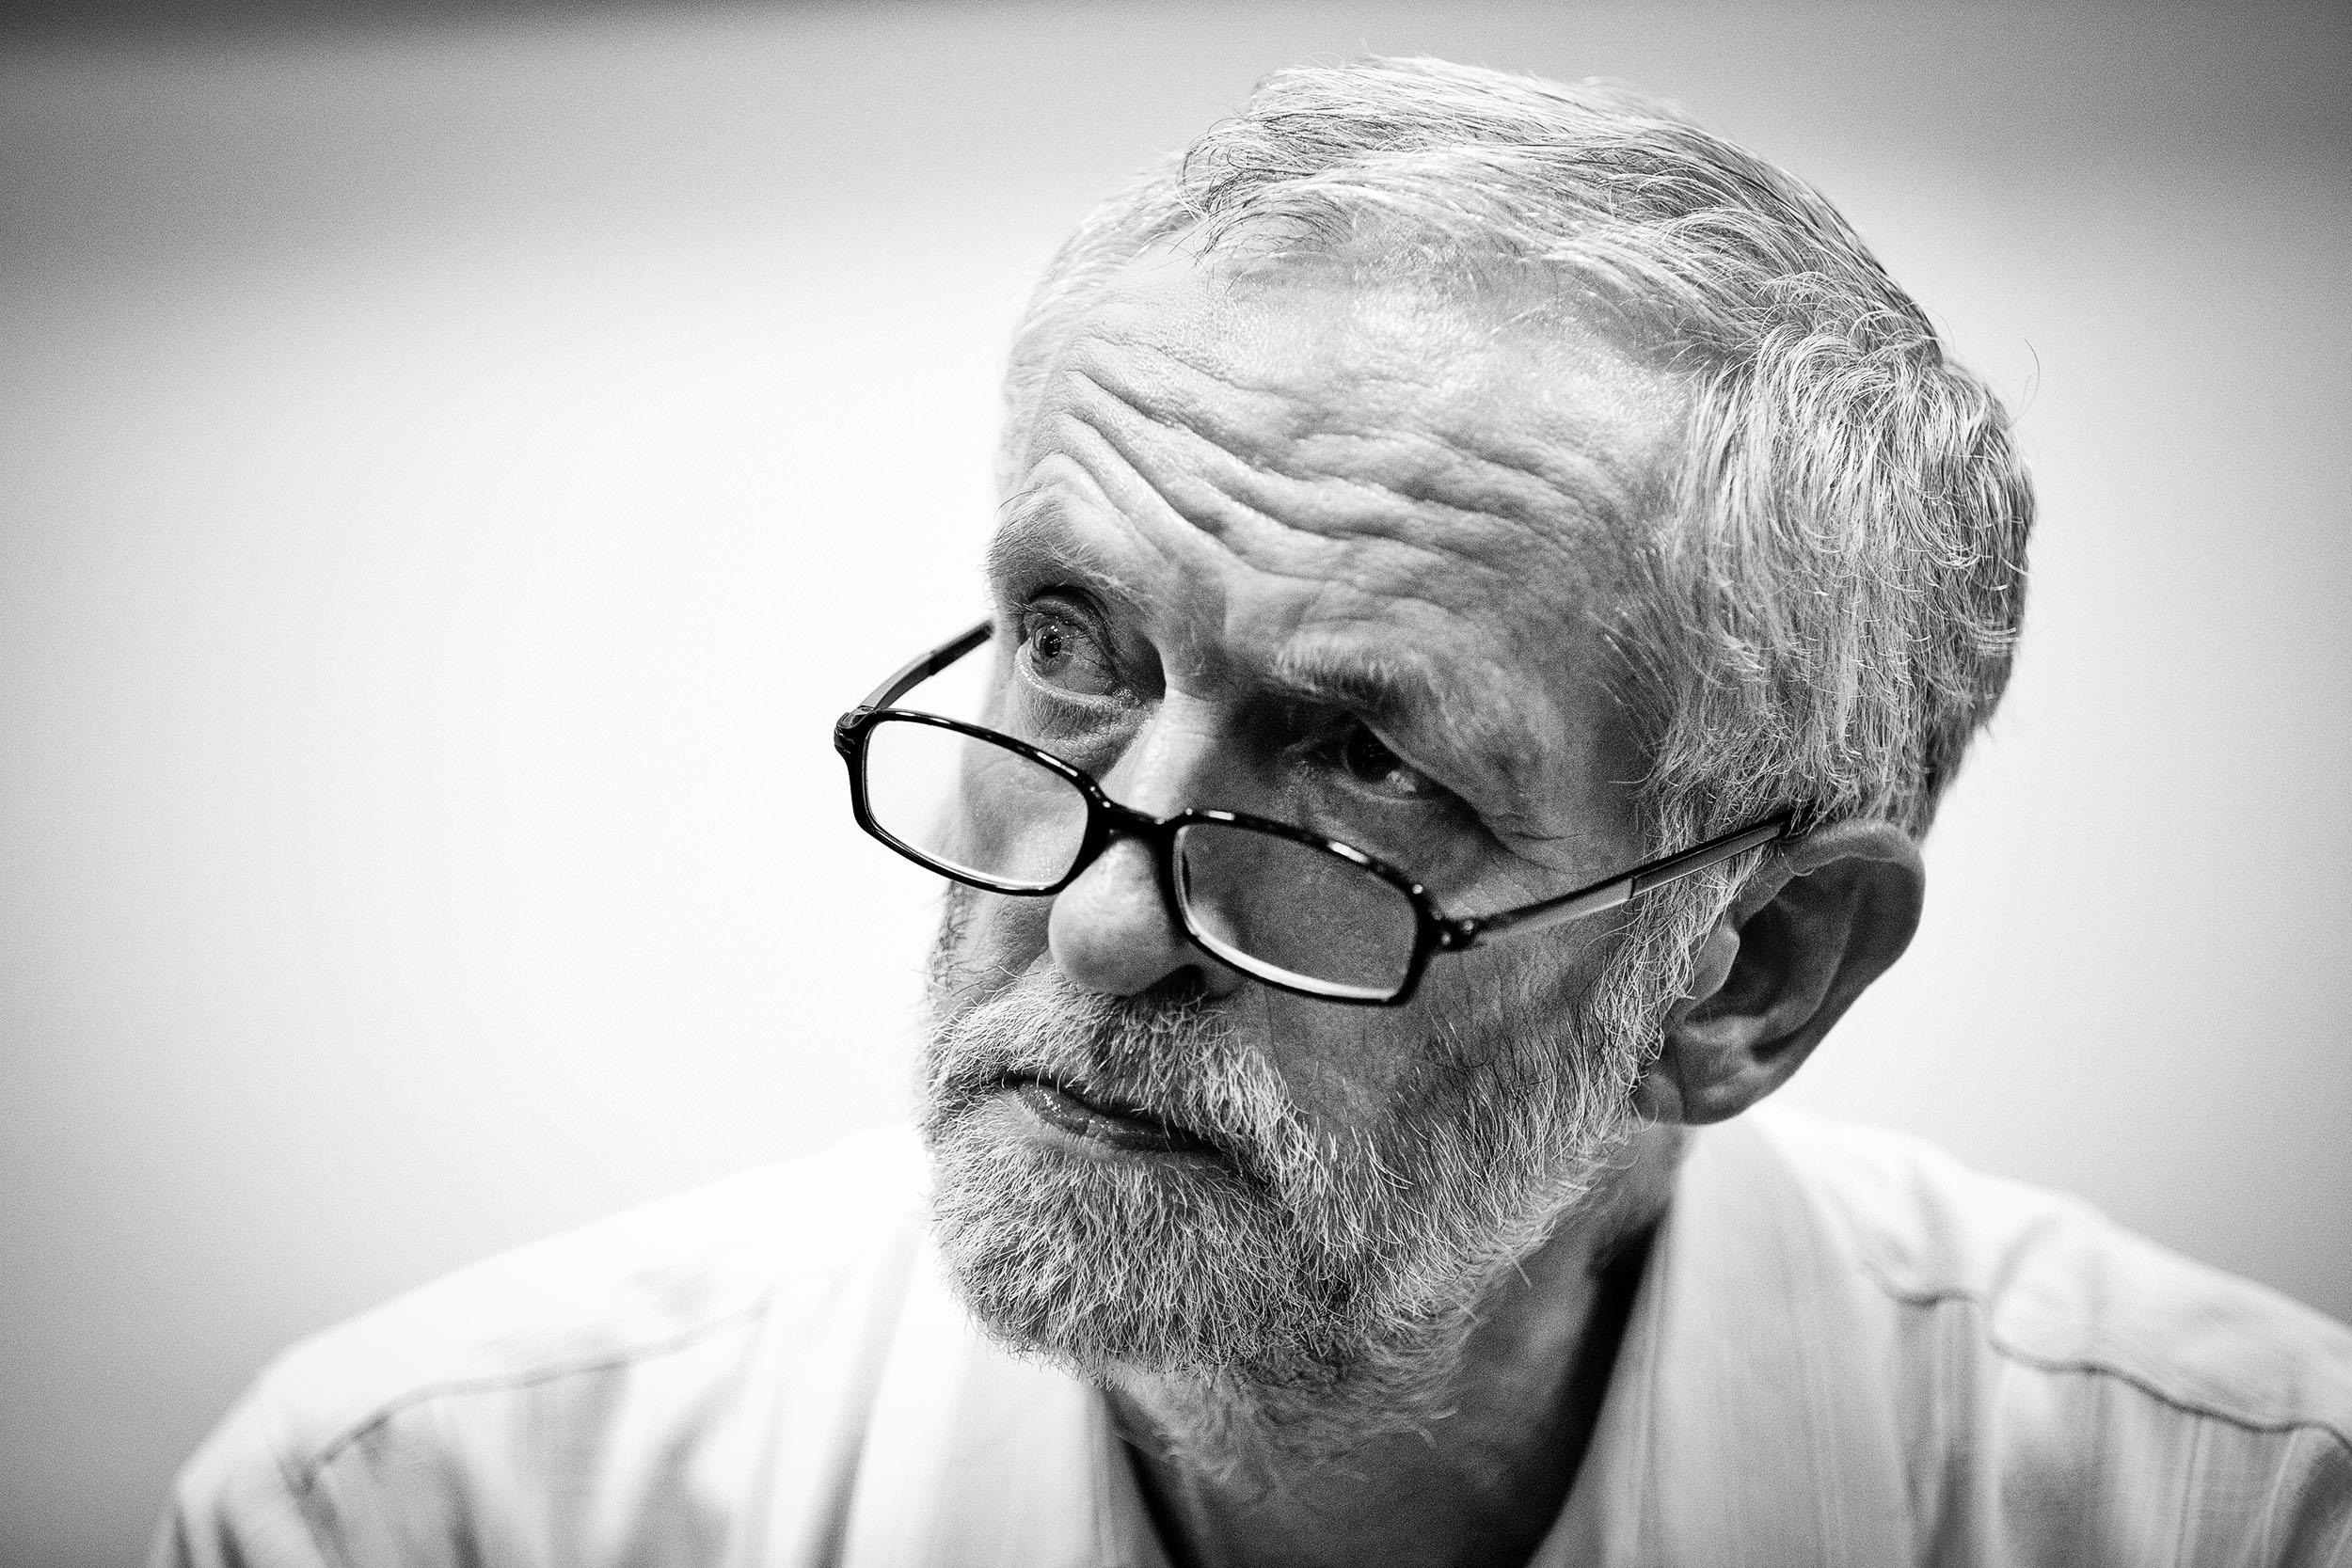 Jeremy Corbyn, Labour Party leader